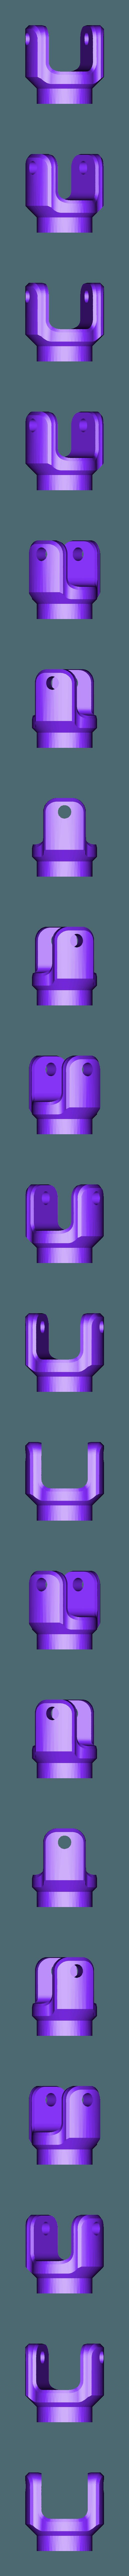 Truck_V4_Centerdiff_Ujoint.STL Download STL file 3D Printed Rc Truck V4 • 3D printable template, MrCrankyface